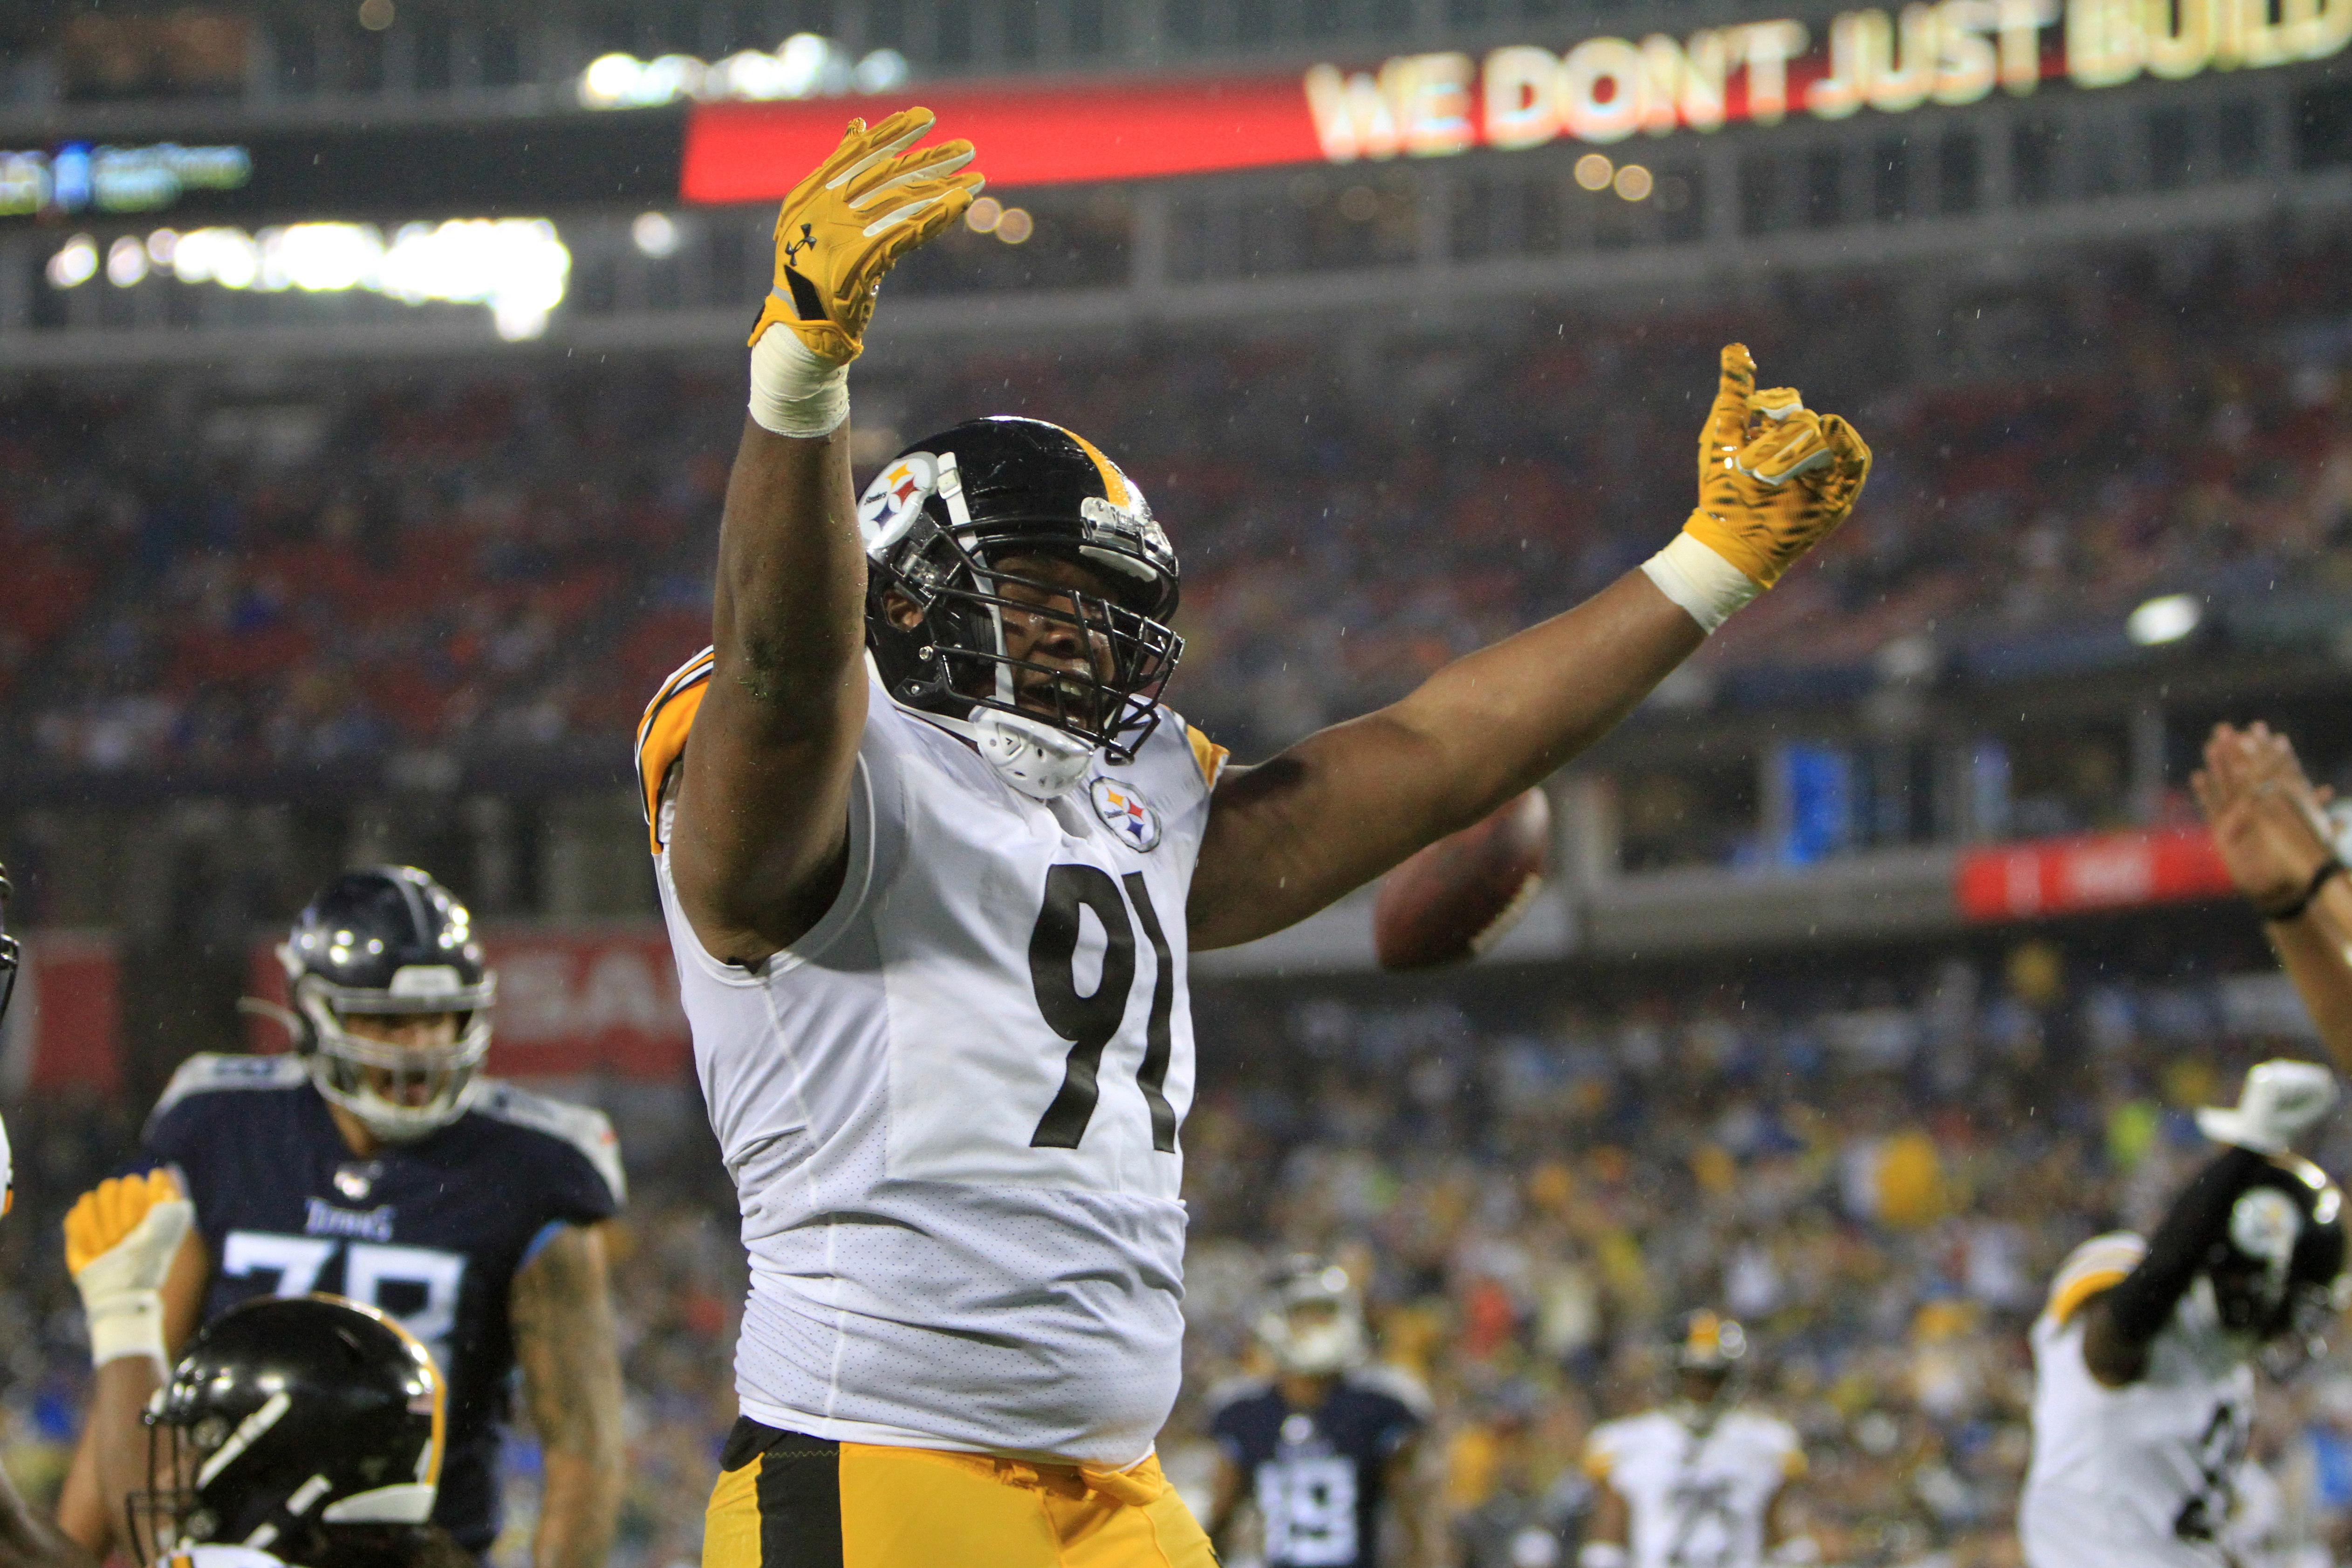 NFL: AUG 25 Preseason - Steelers at Titans